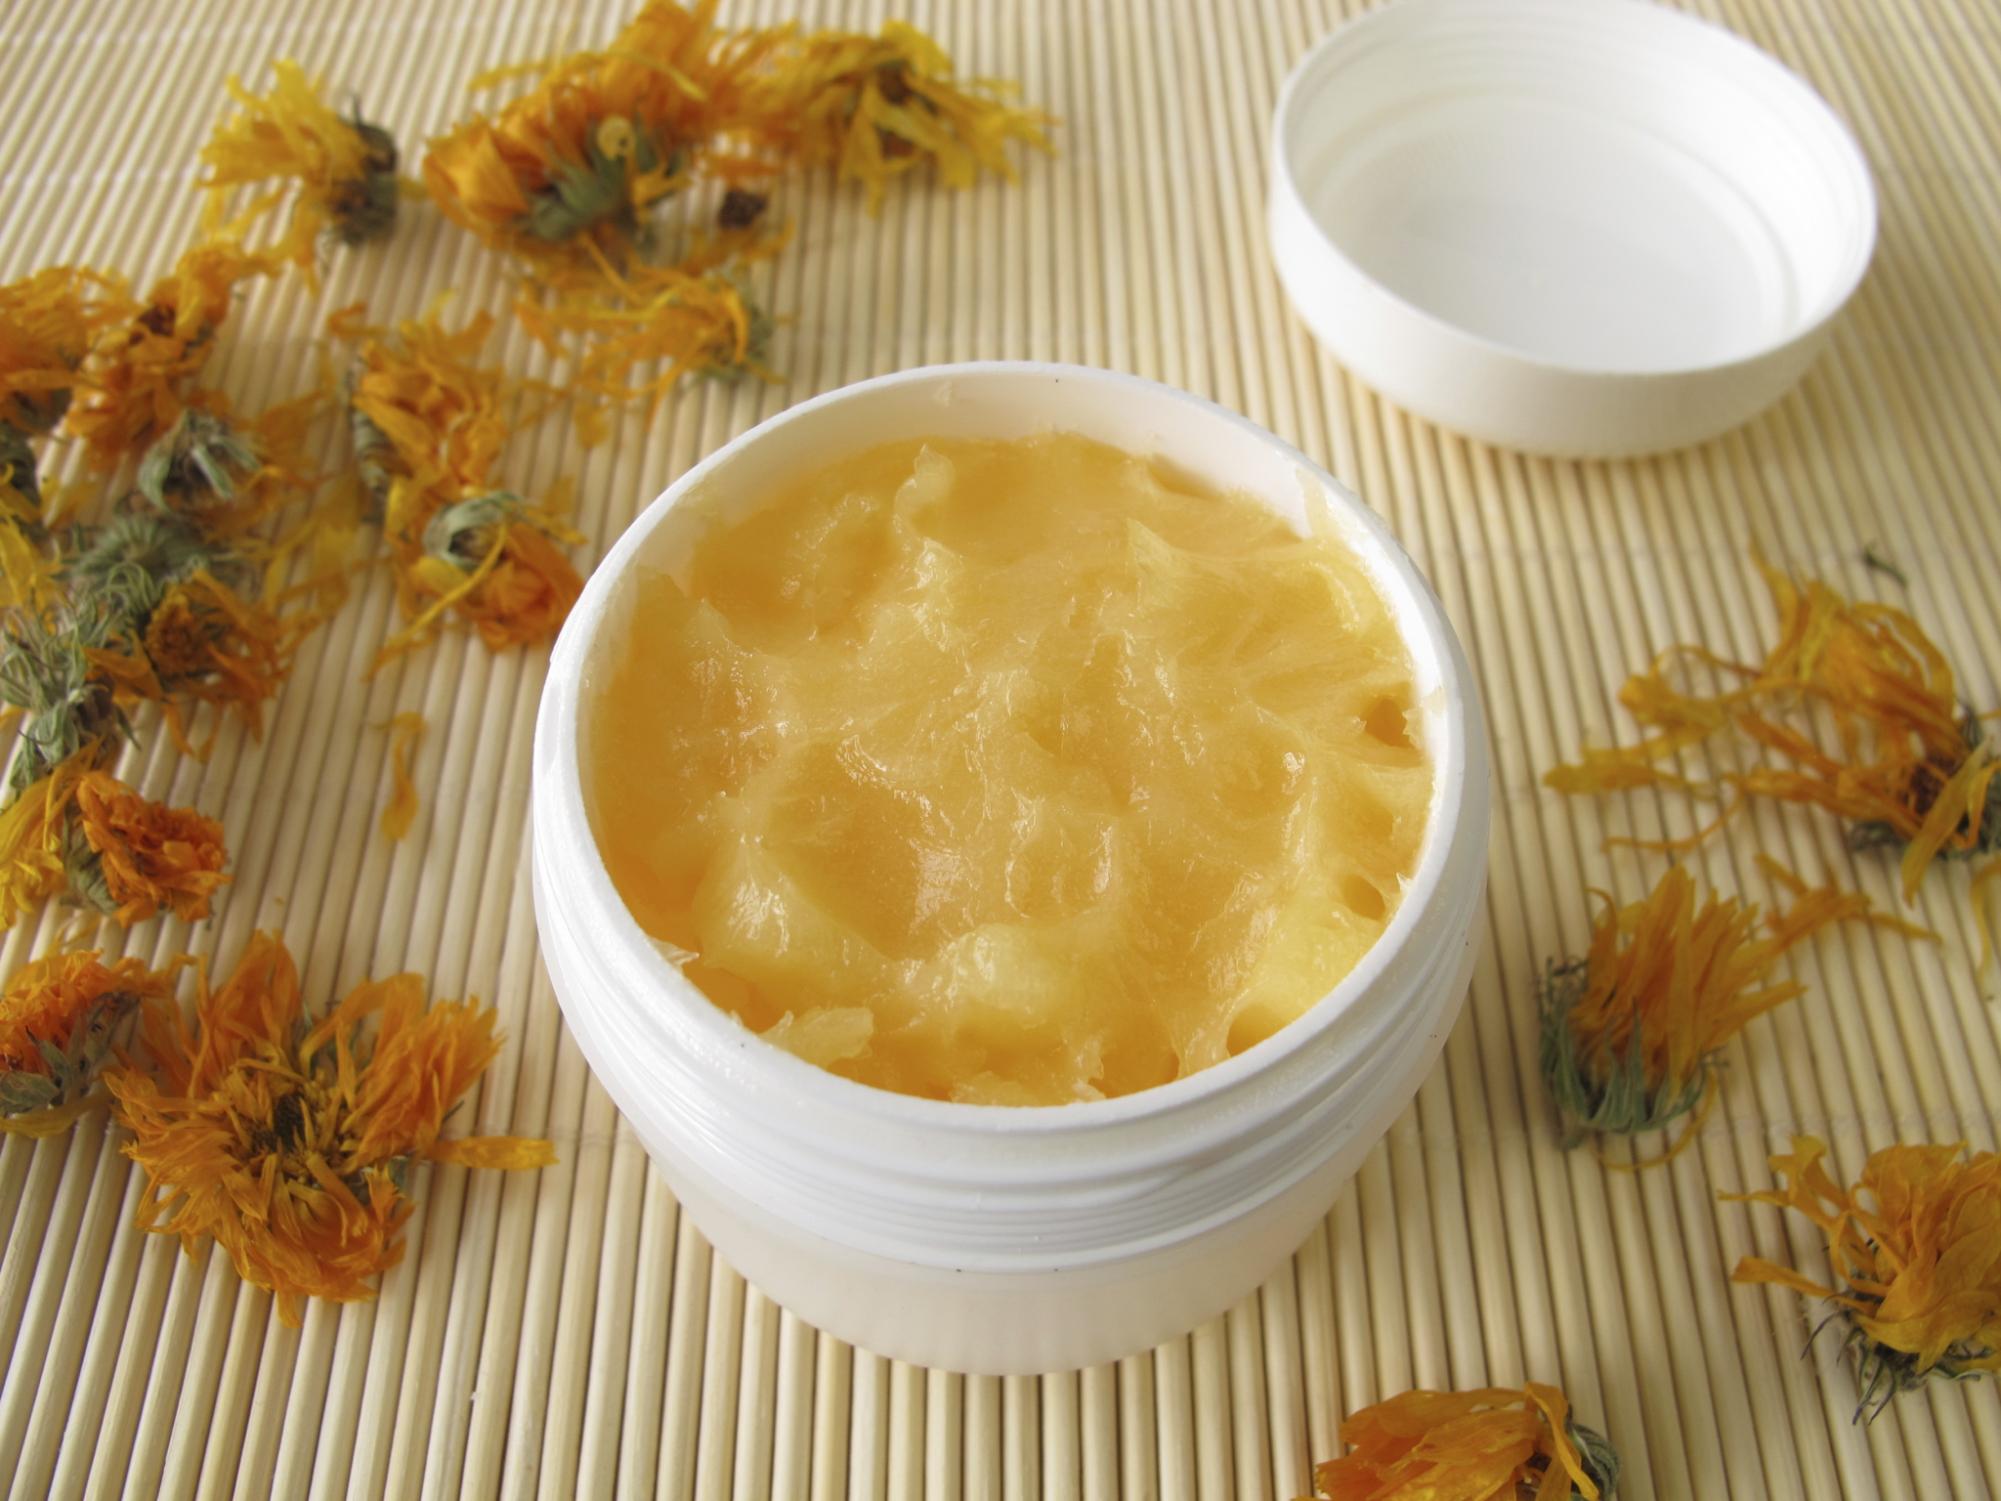 ricetta crema viso fai da te cera d'api